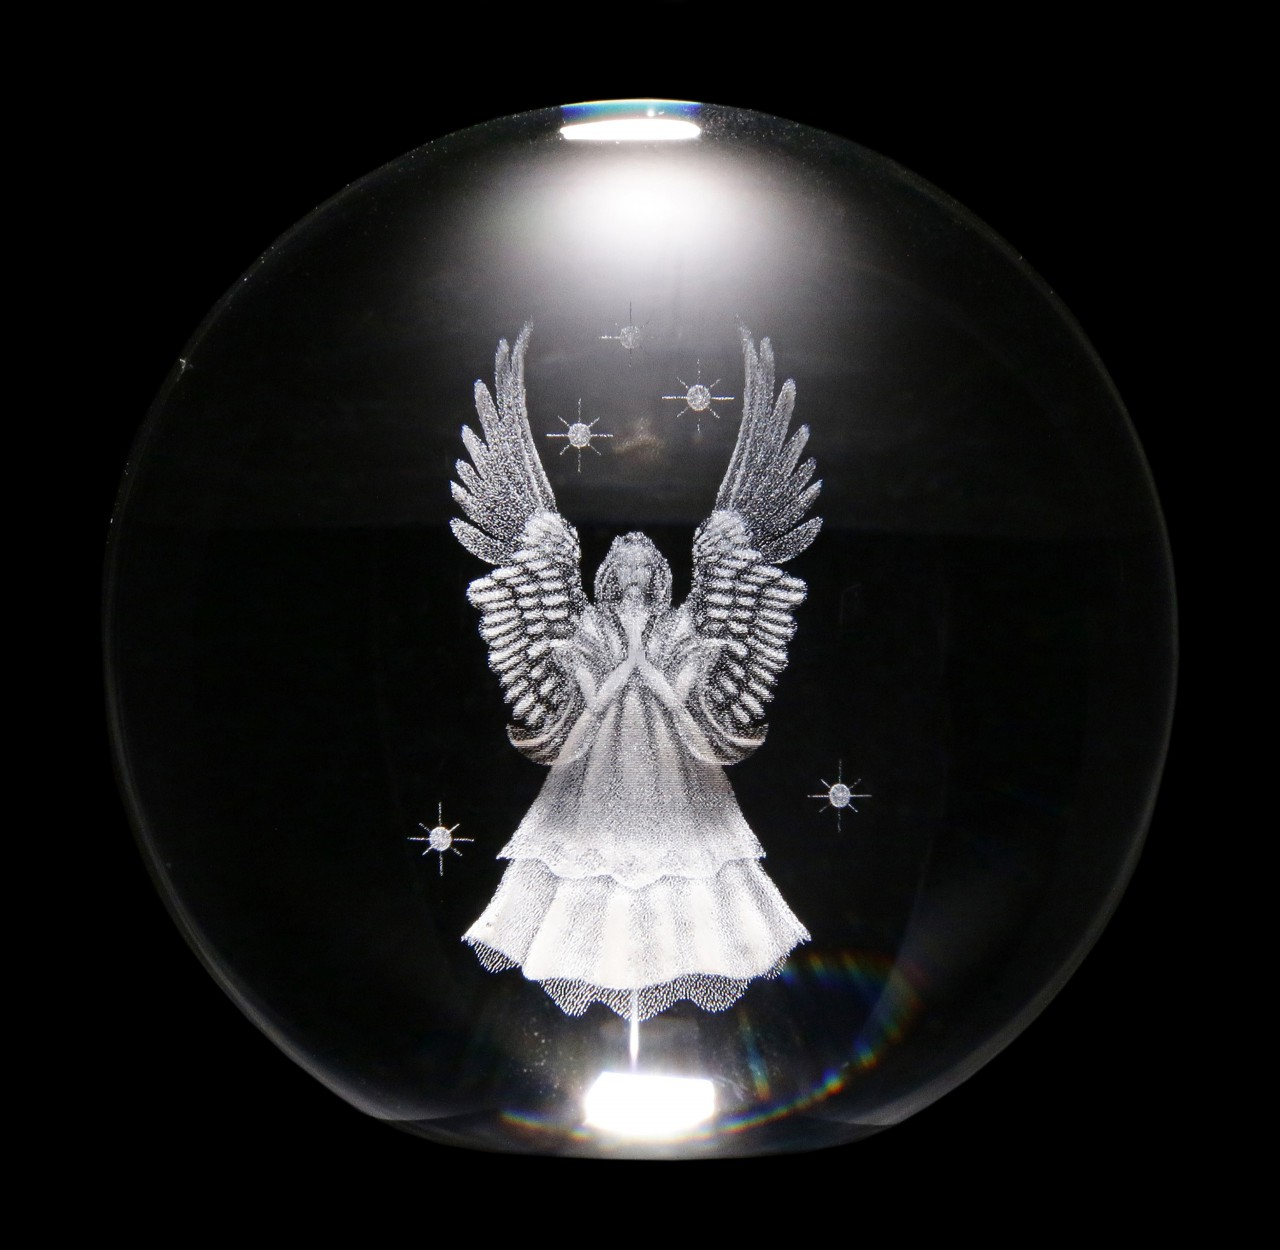 Wahrsager Kugel mit Engel - 8 cm